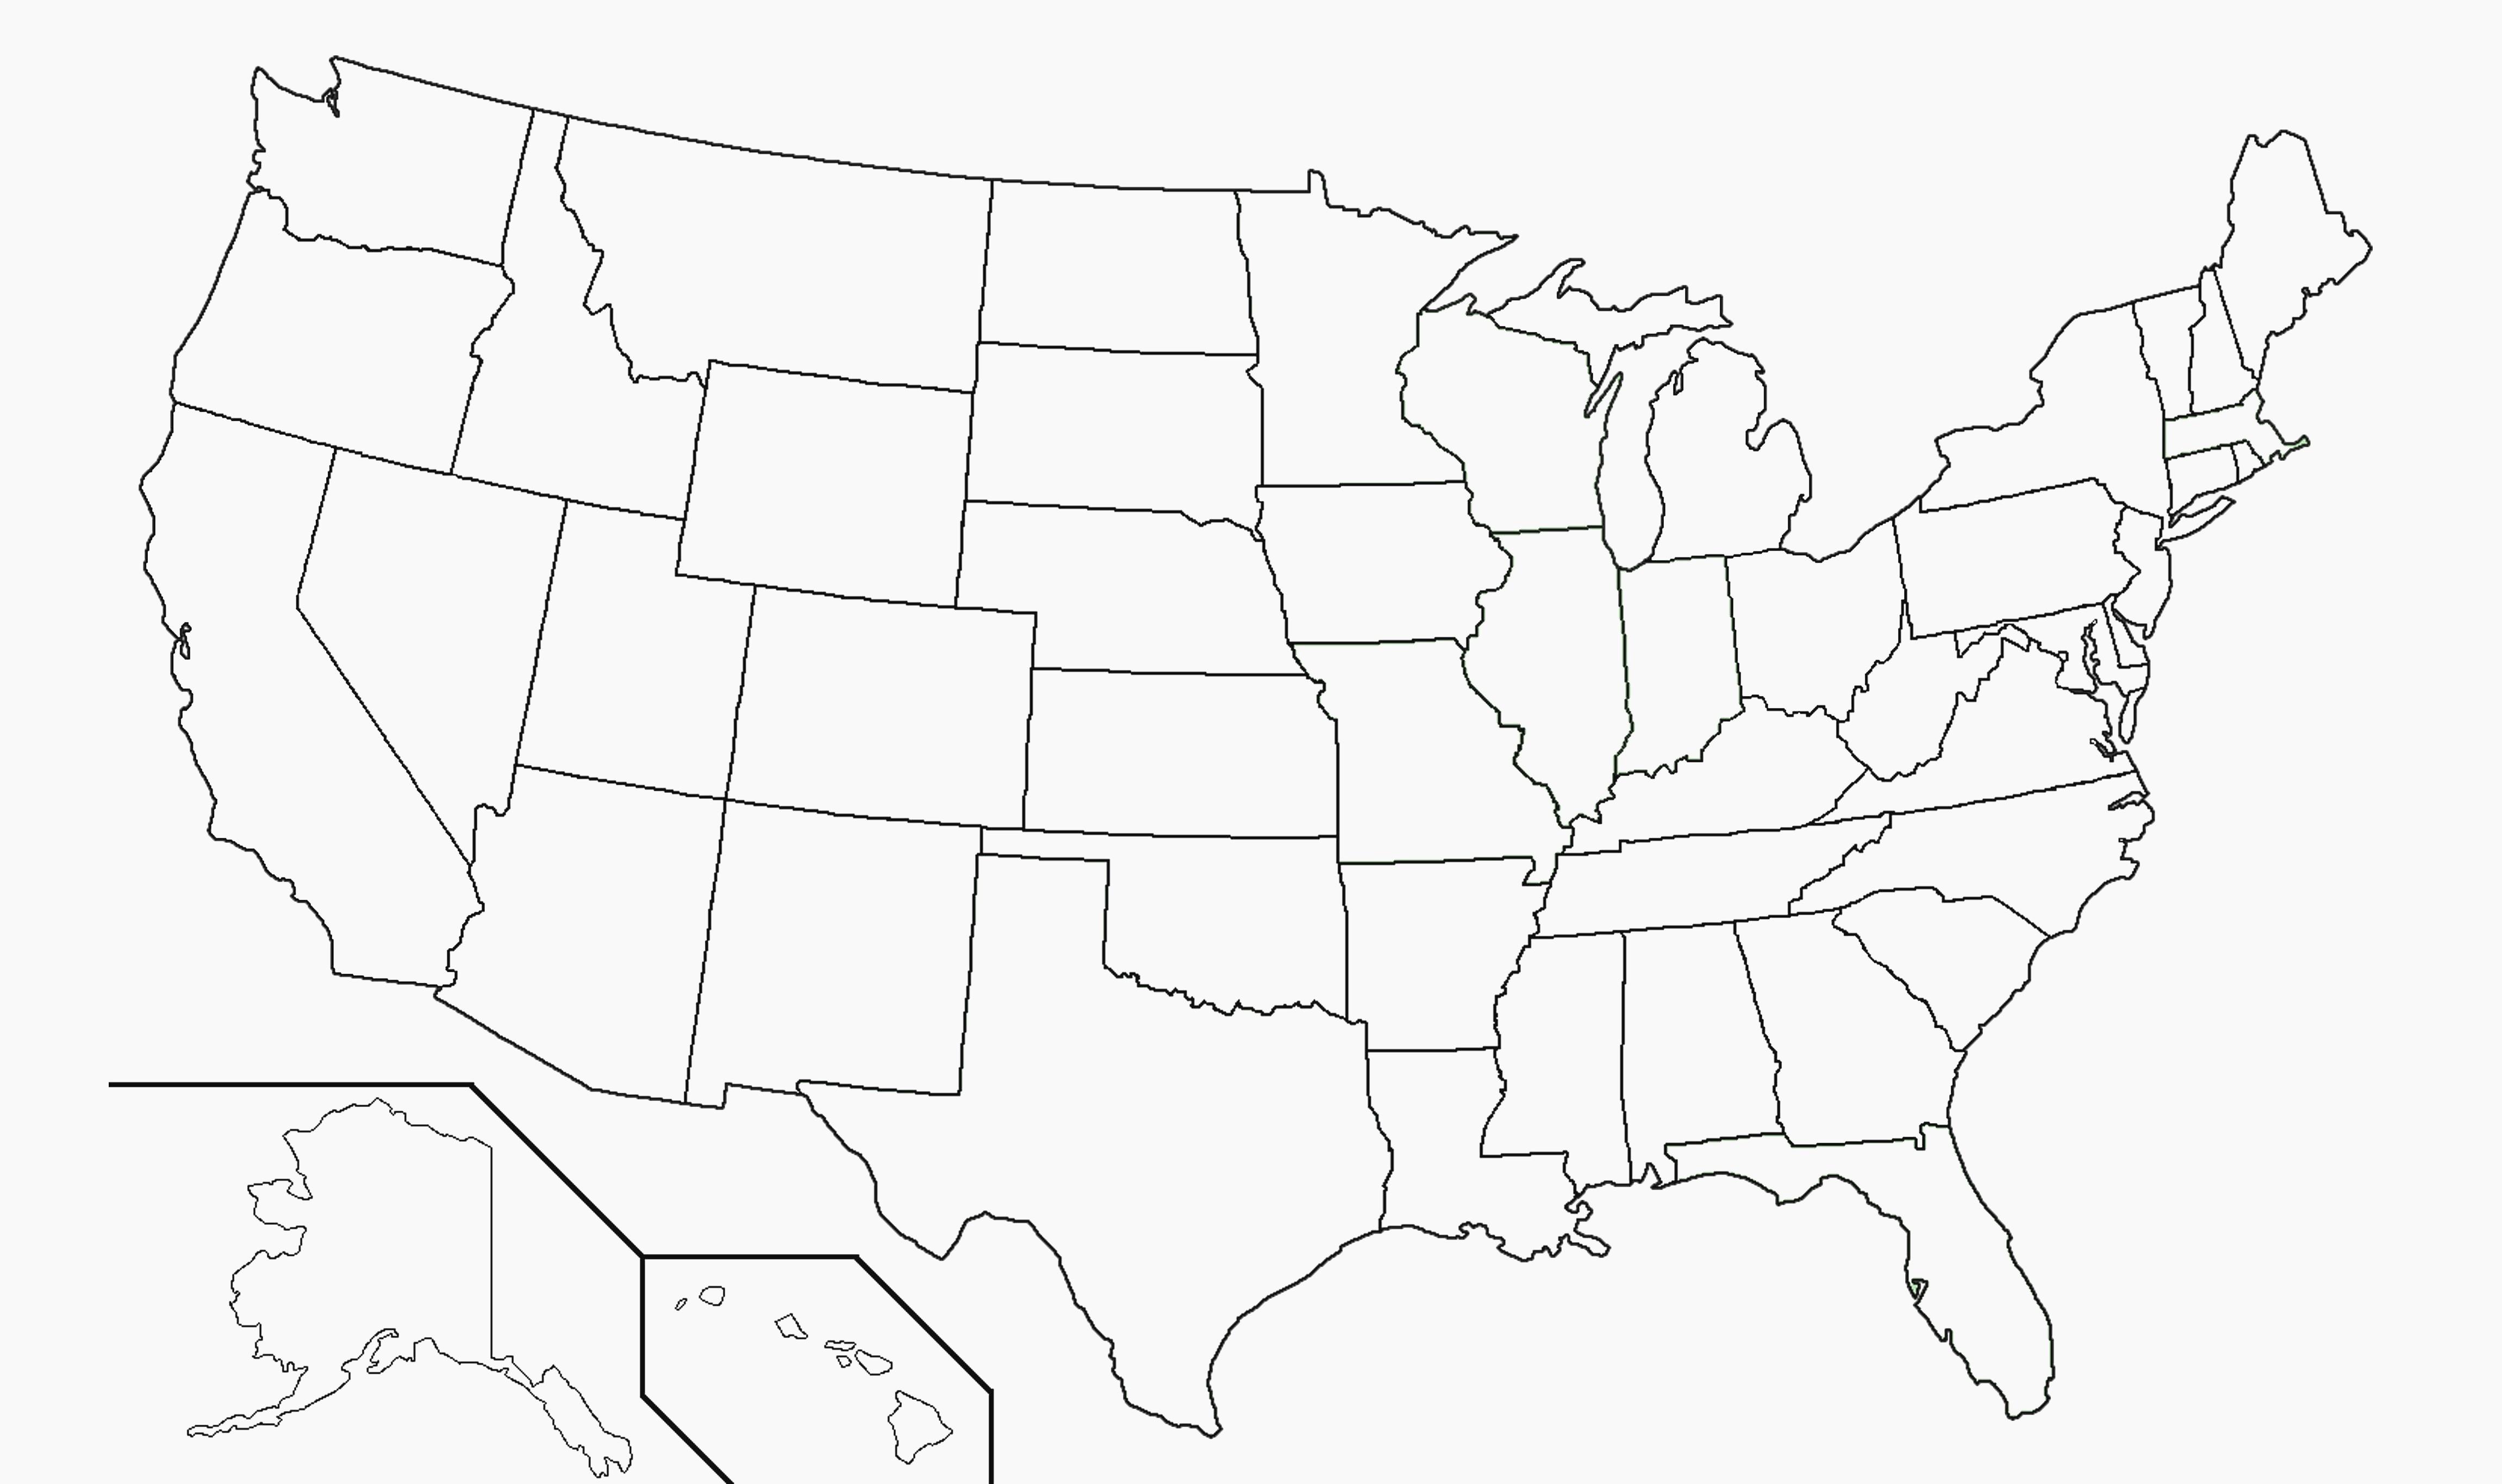 Blank Us Map Including Alaska And Hawaii Archives - Clanrobot - Free Printable Map Of Alaska